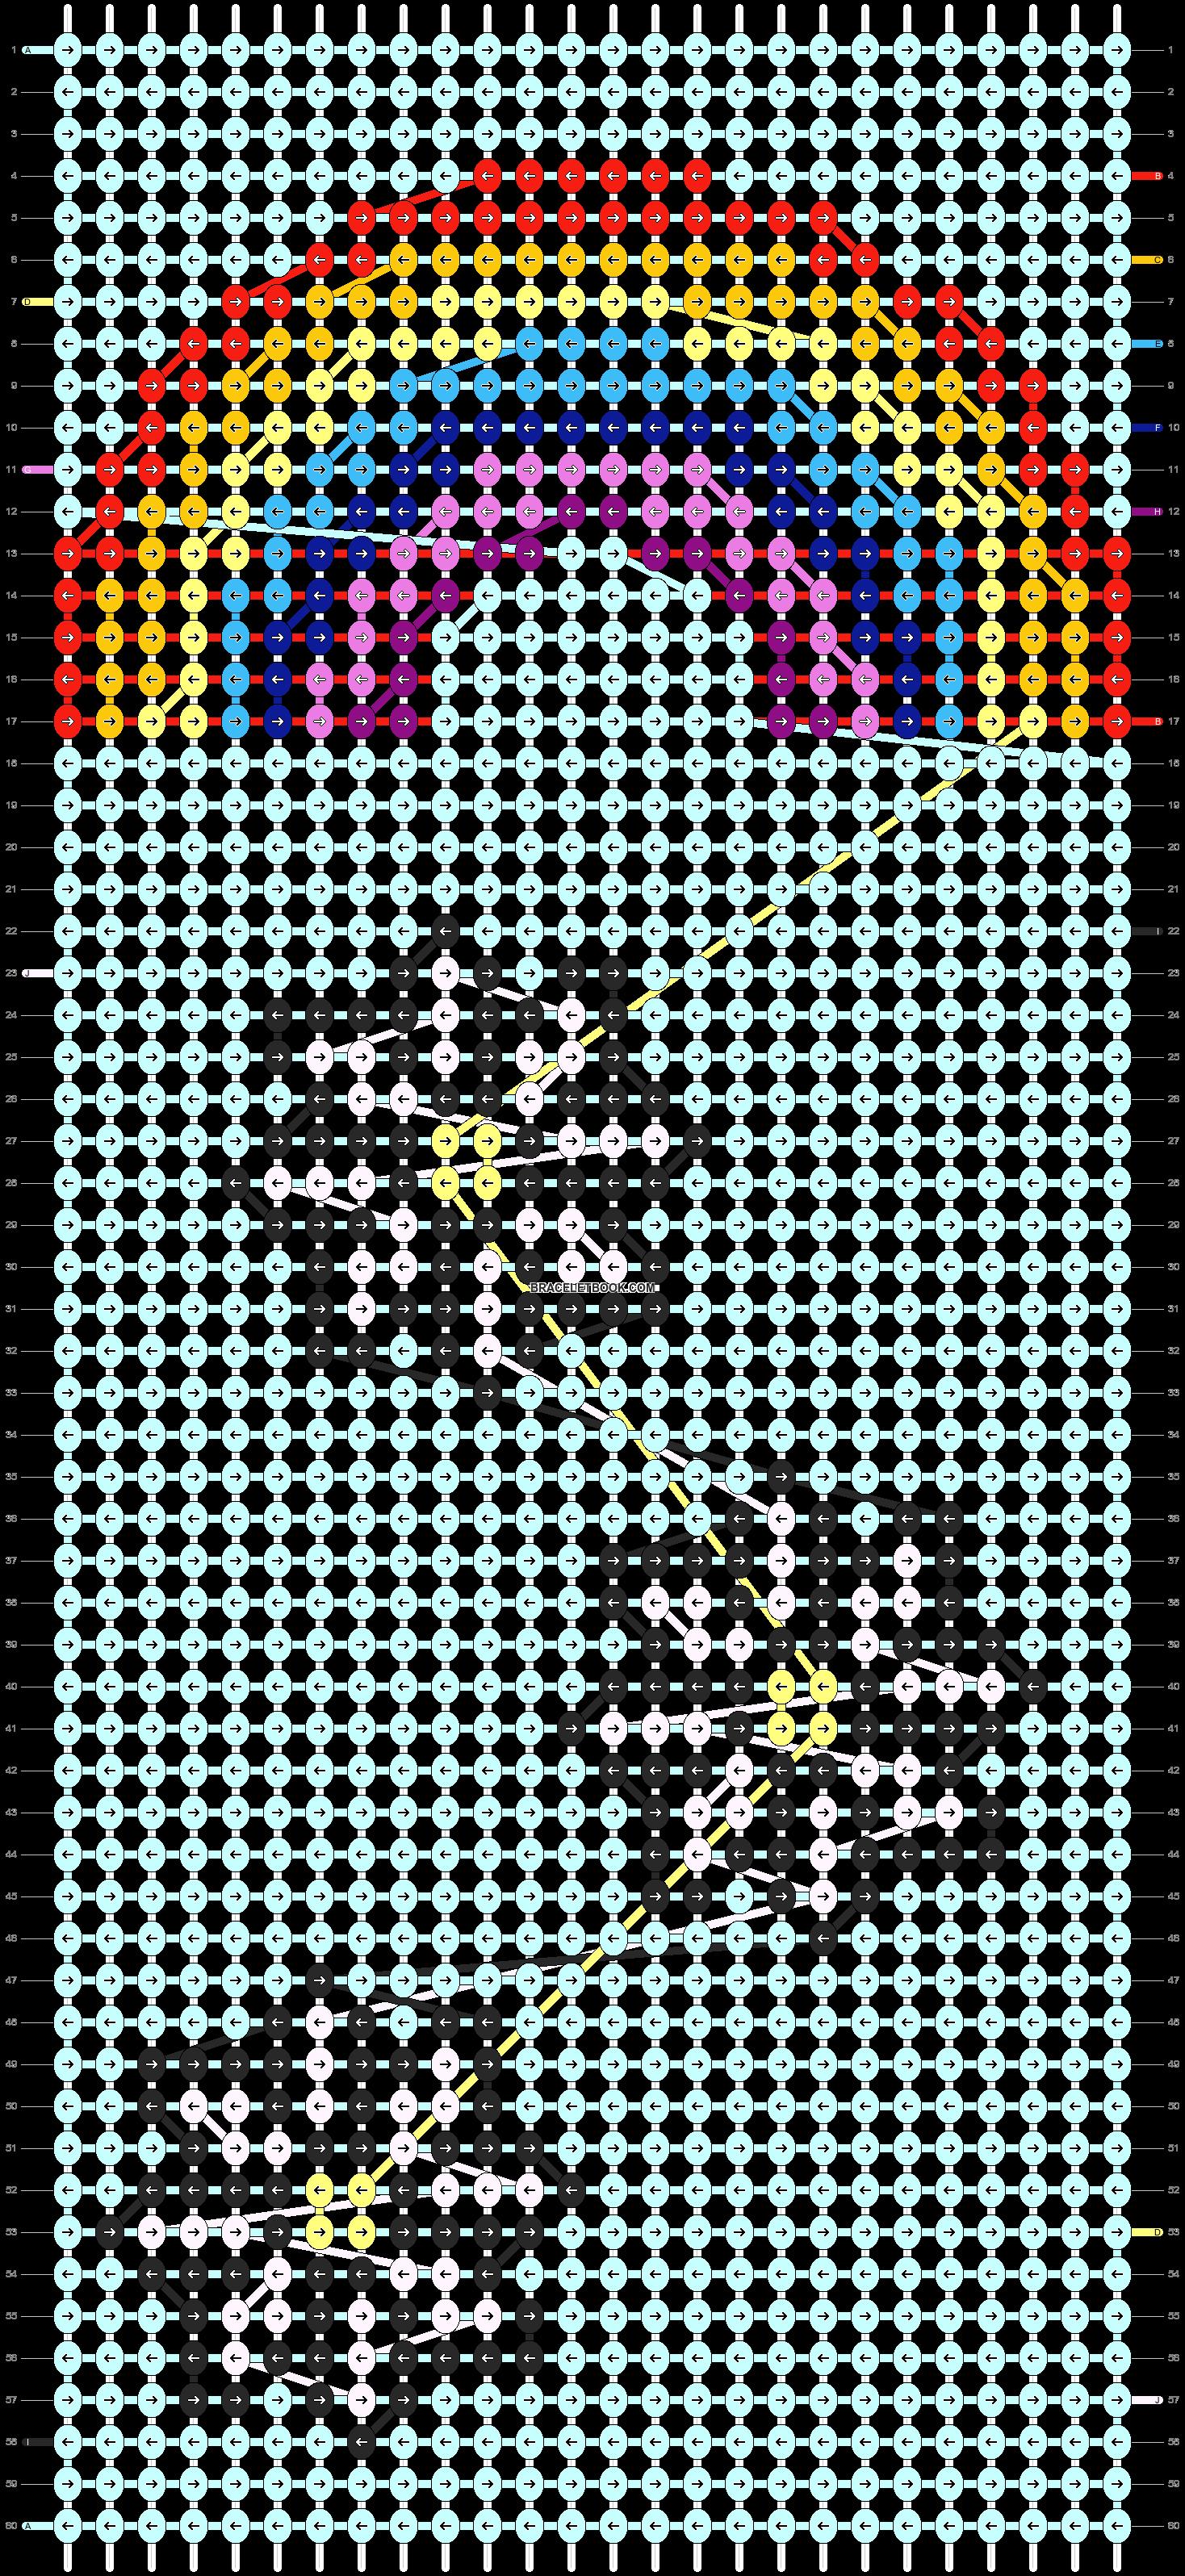 Alpha Pattern #21907 added by SalamontyM